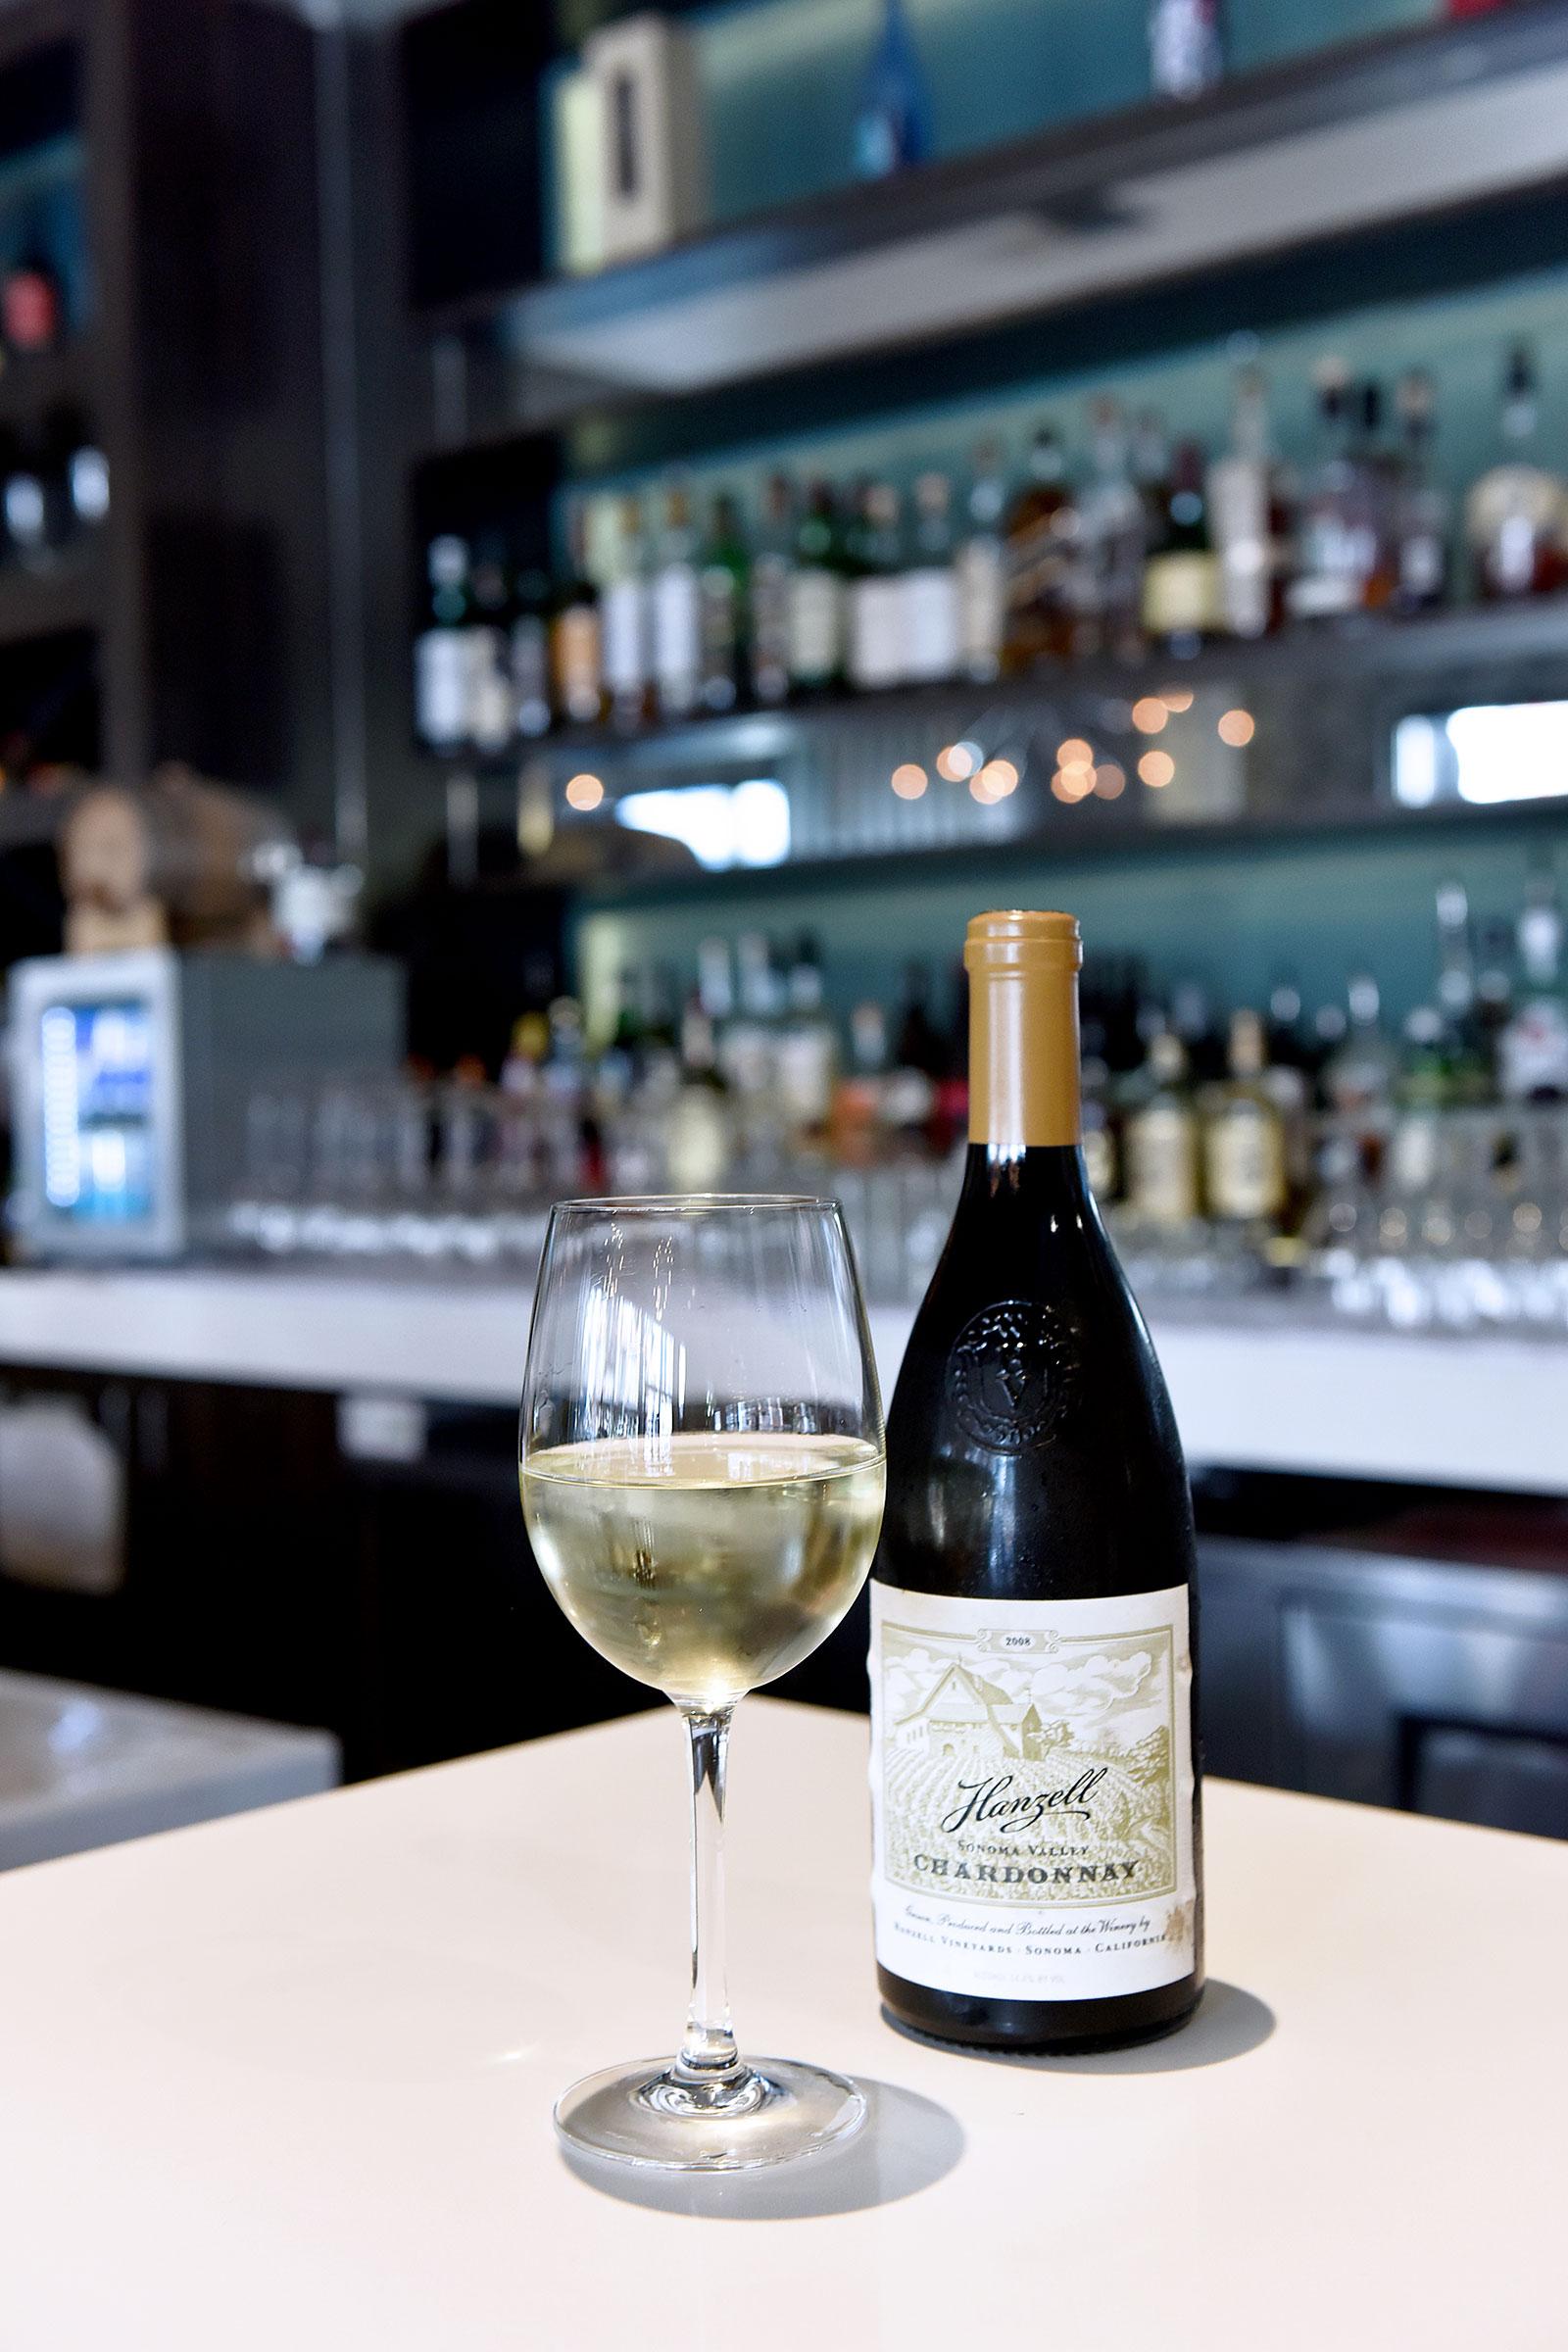 Hanzell Chardonnay